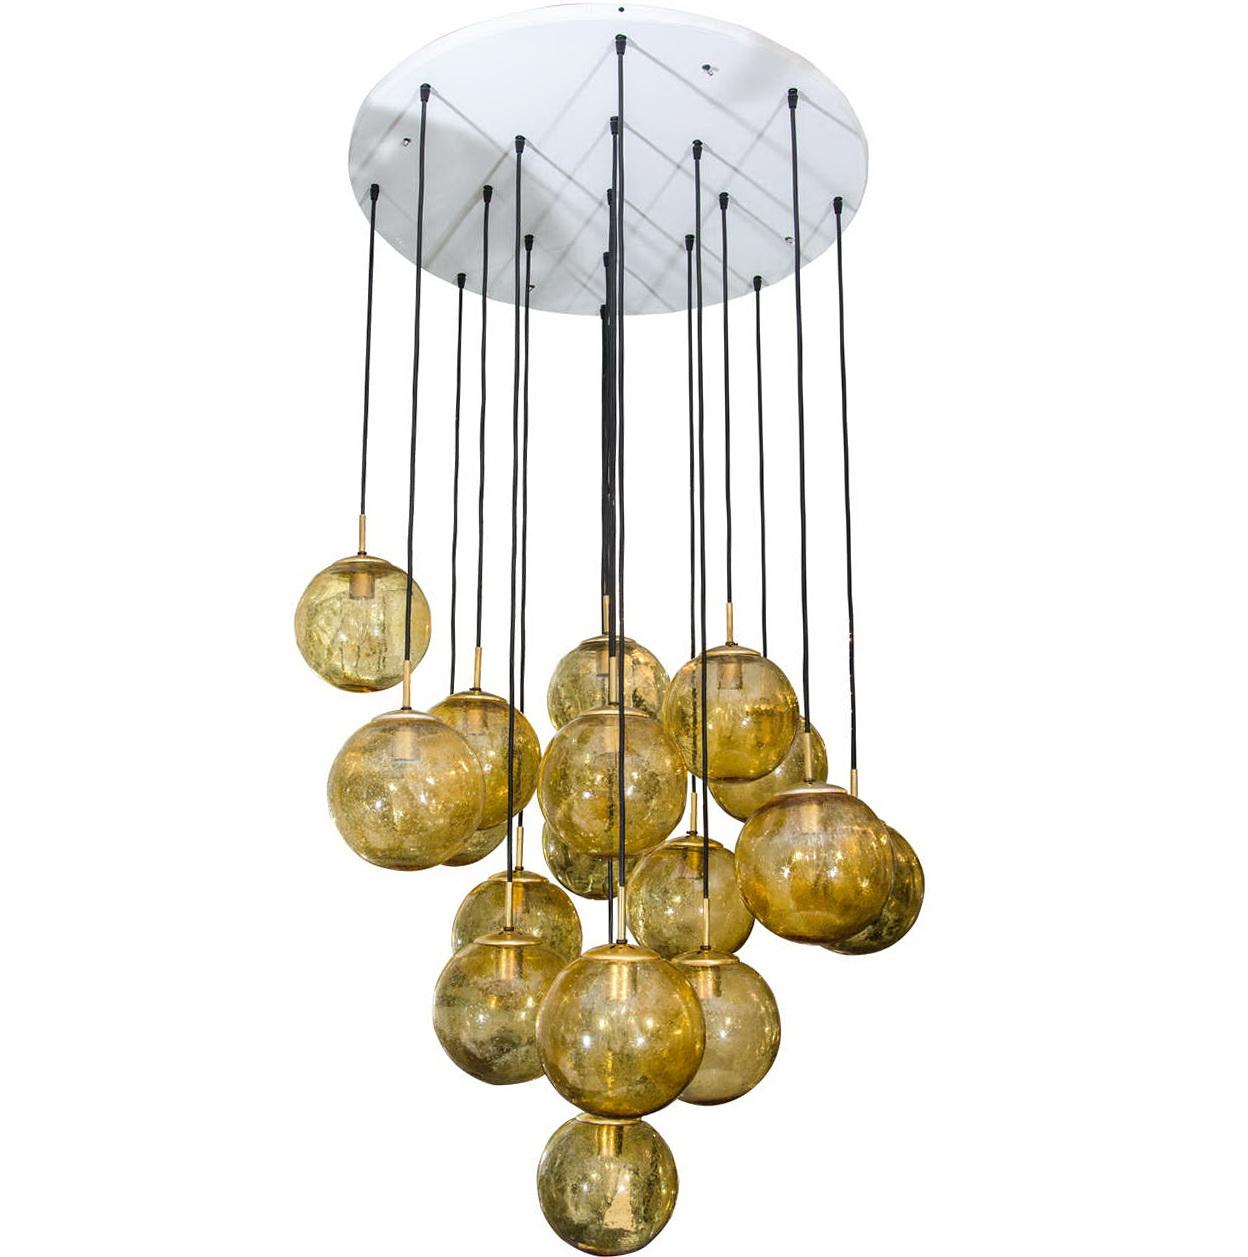 Glass Globe Chandelier Lighting